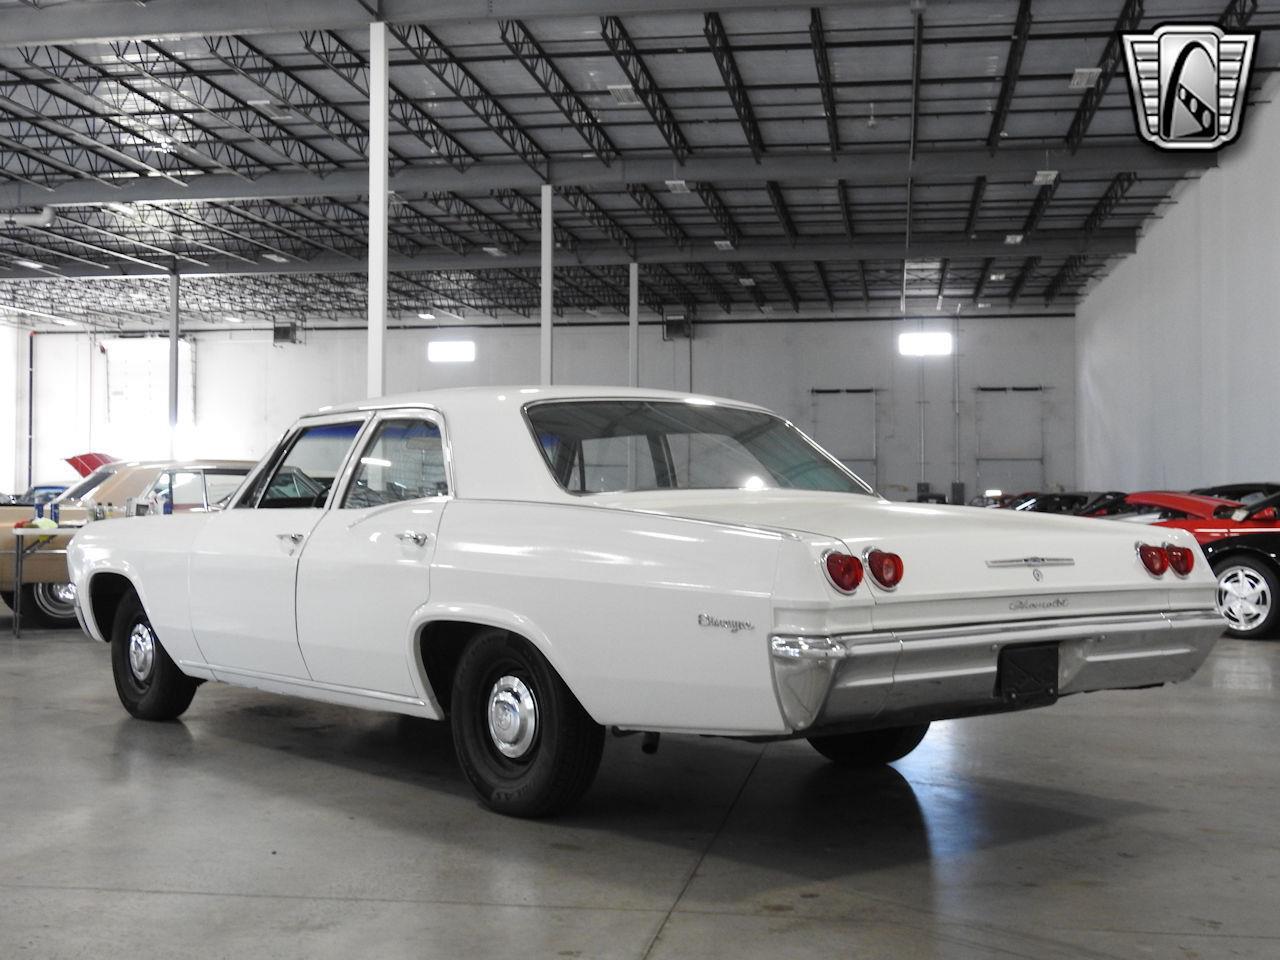 1965 Chevrolet Biscayne (CC-1357743) for sale in O'Fallon, Illinois